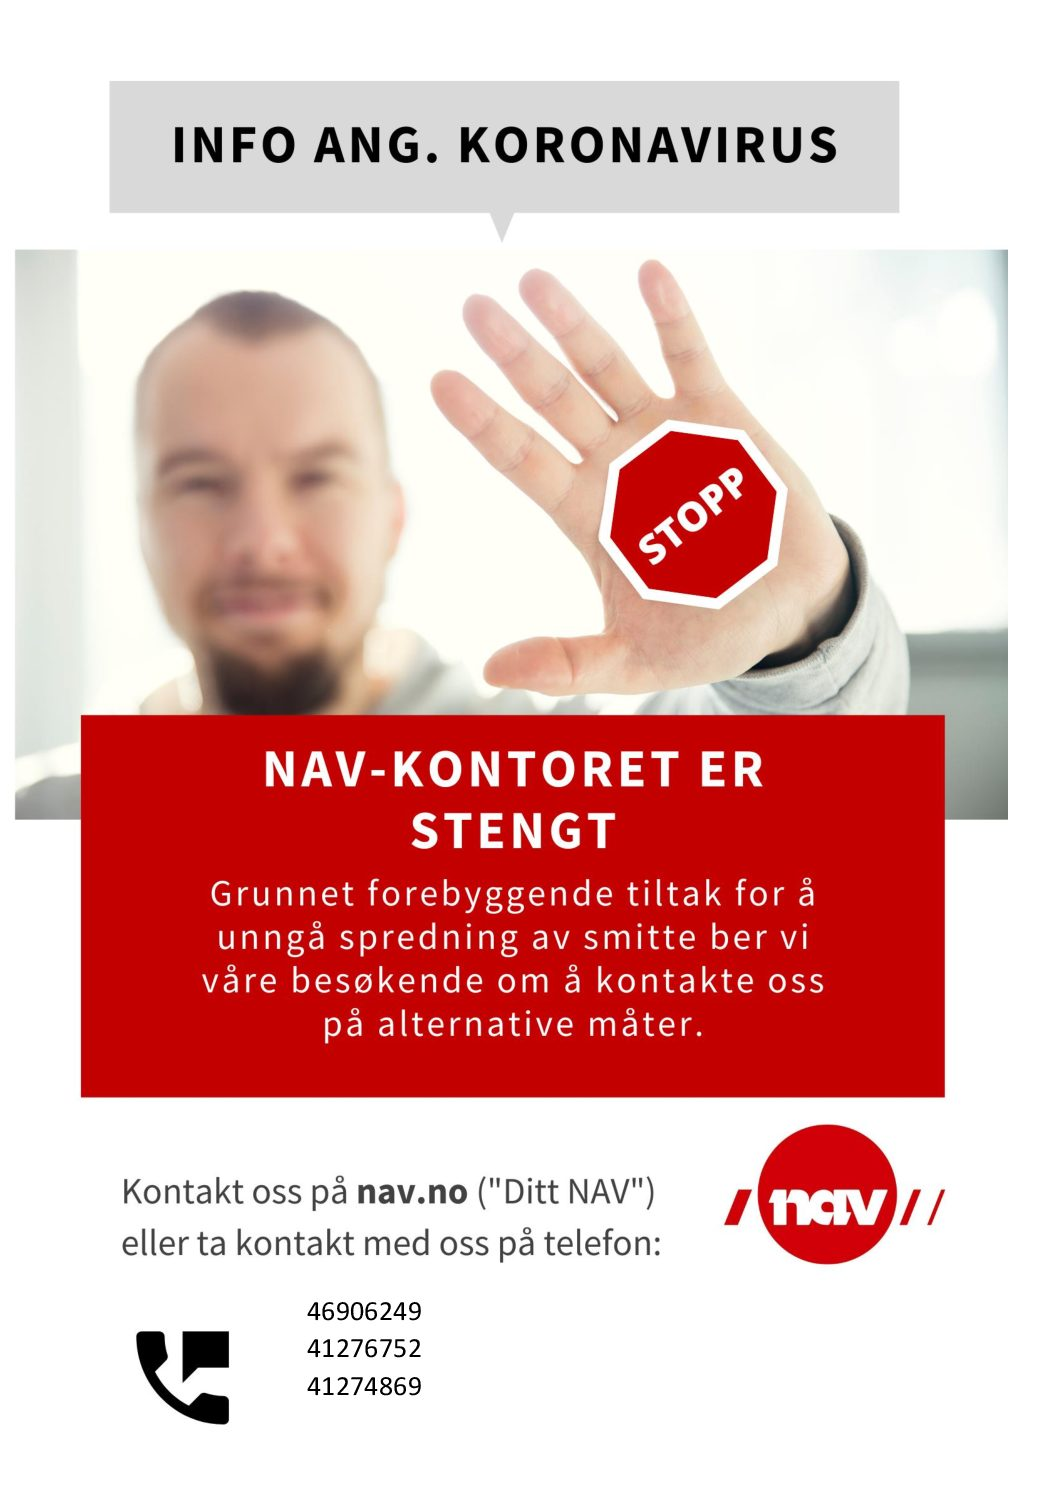 NAV-kontoret er stengt